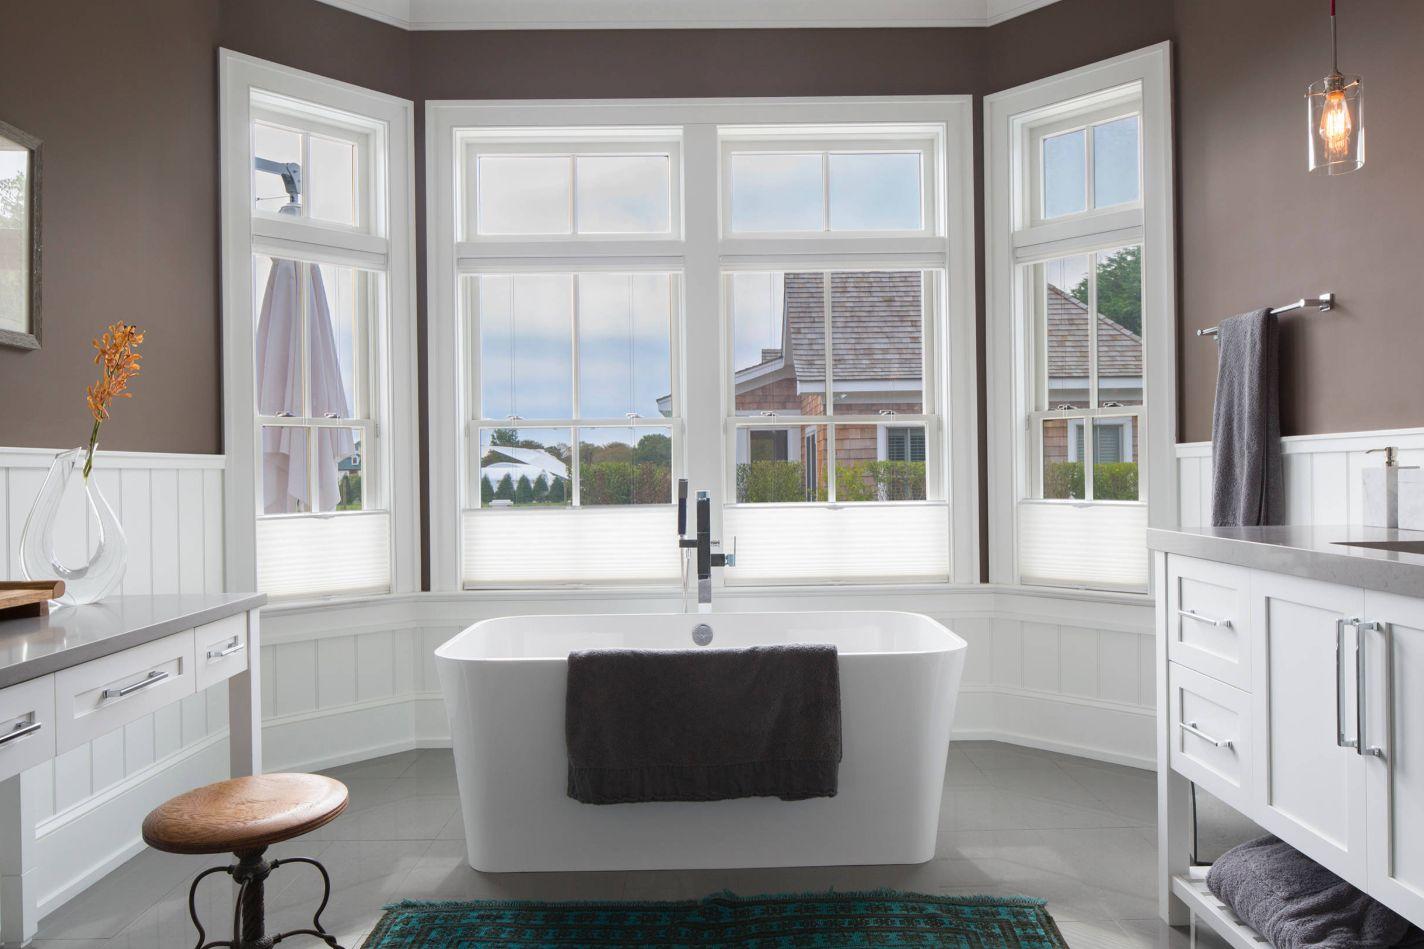 Bathroom-with-window-and-beadboard